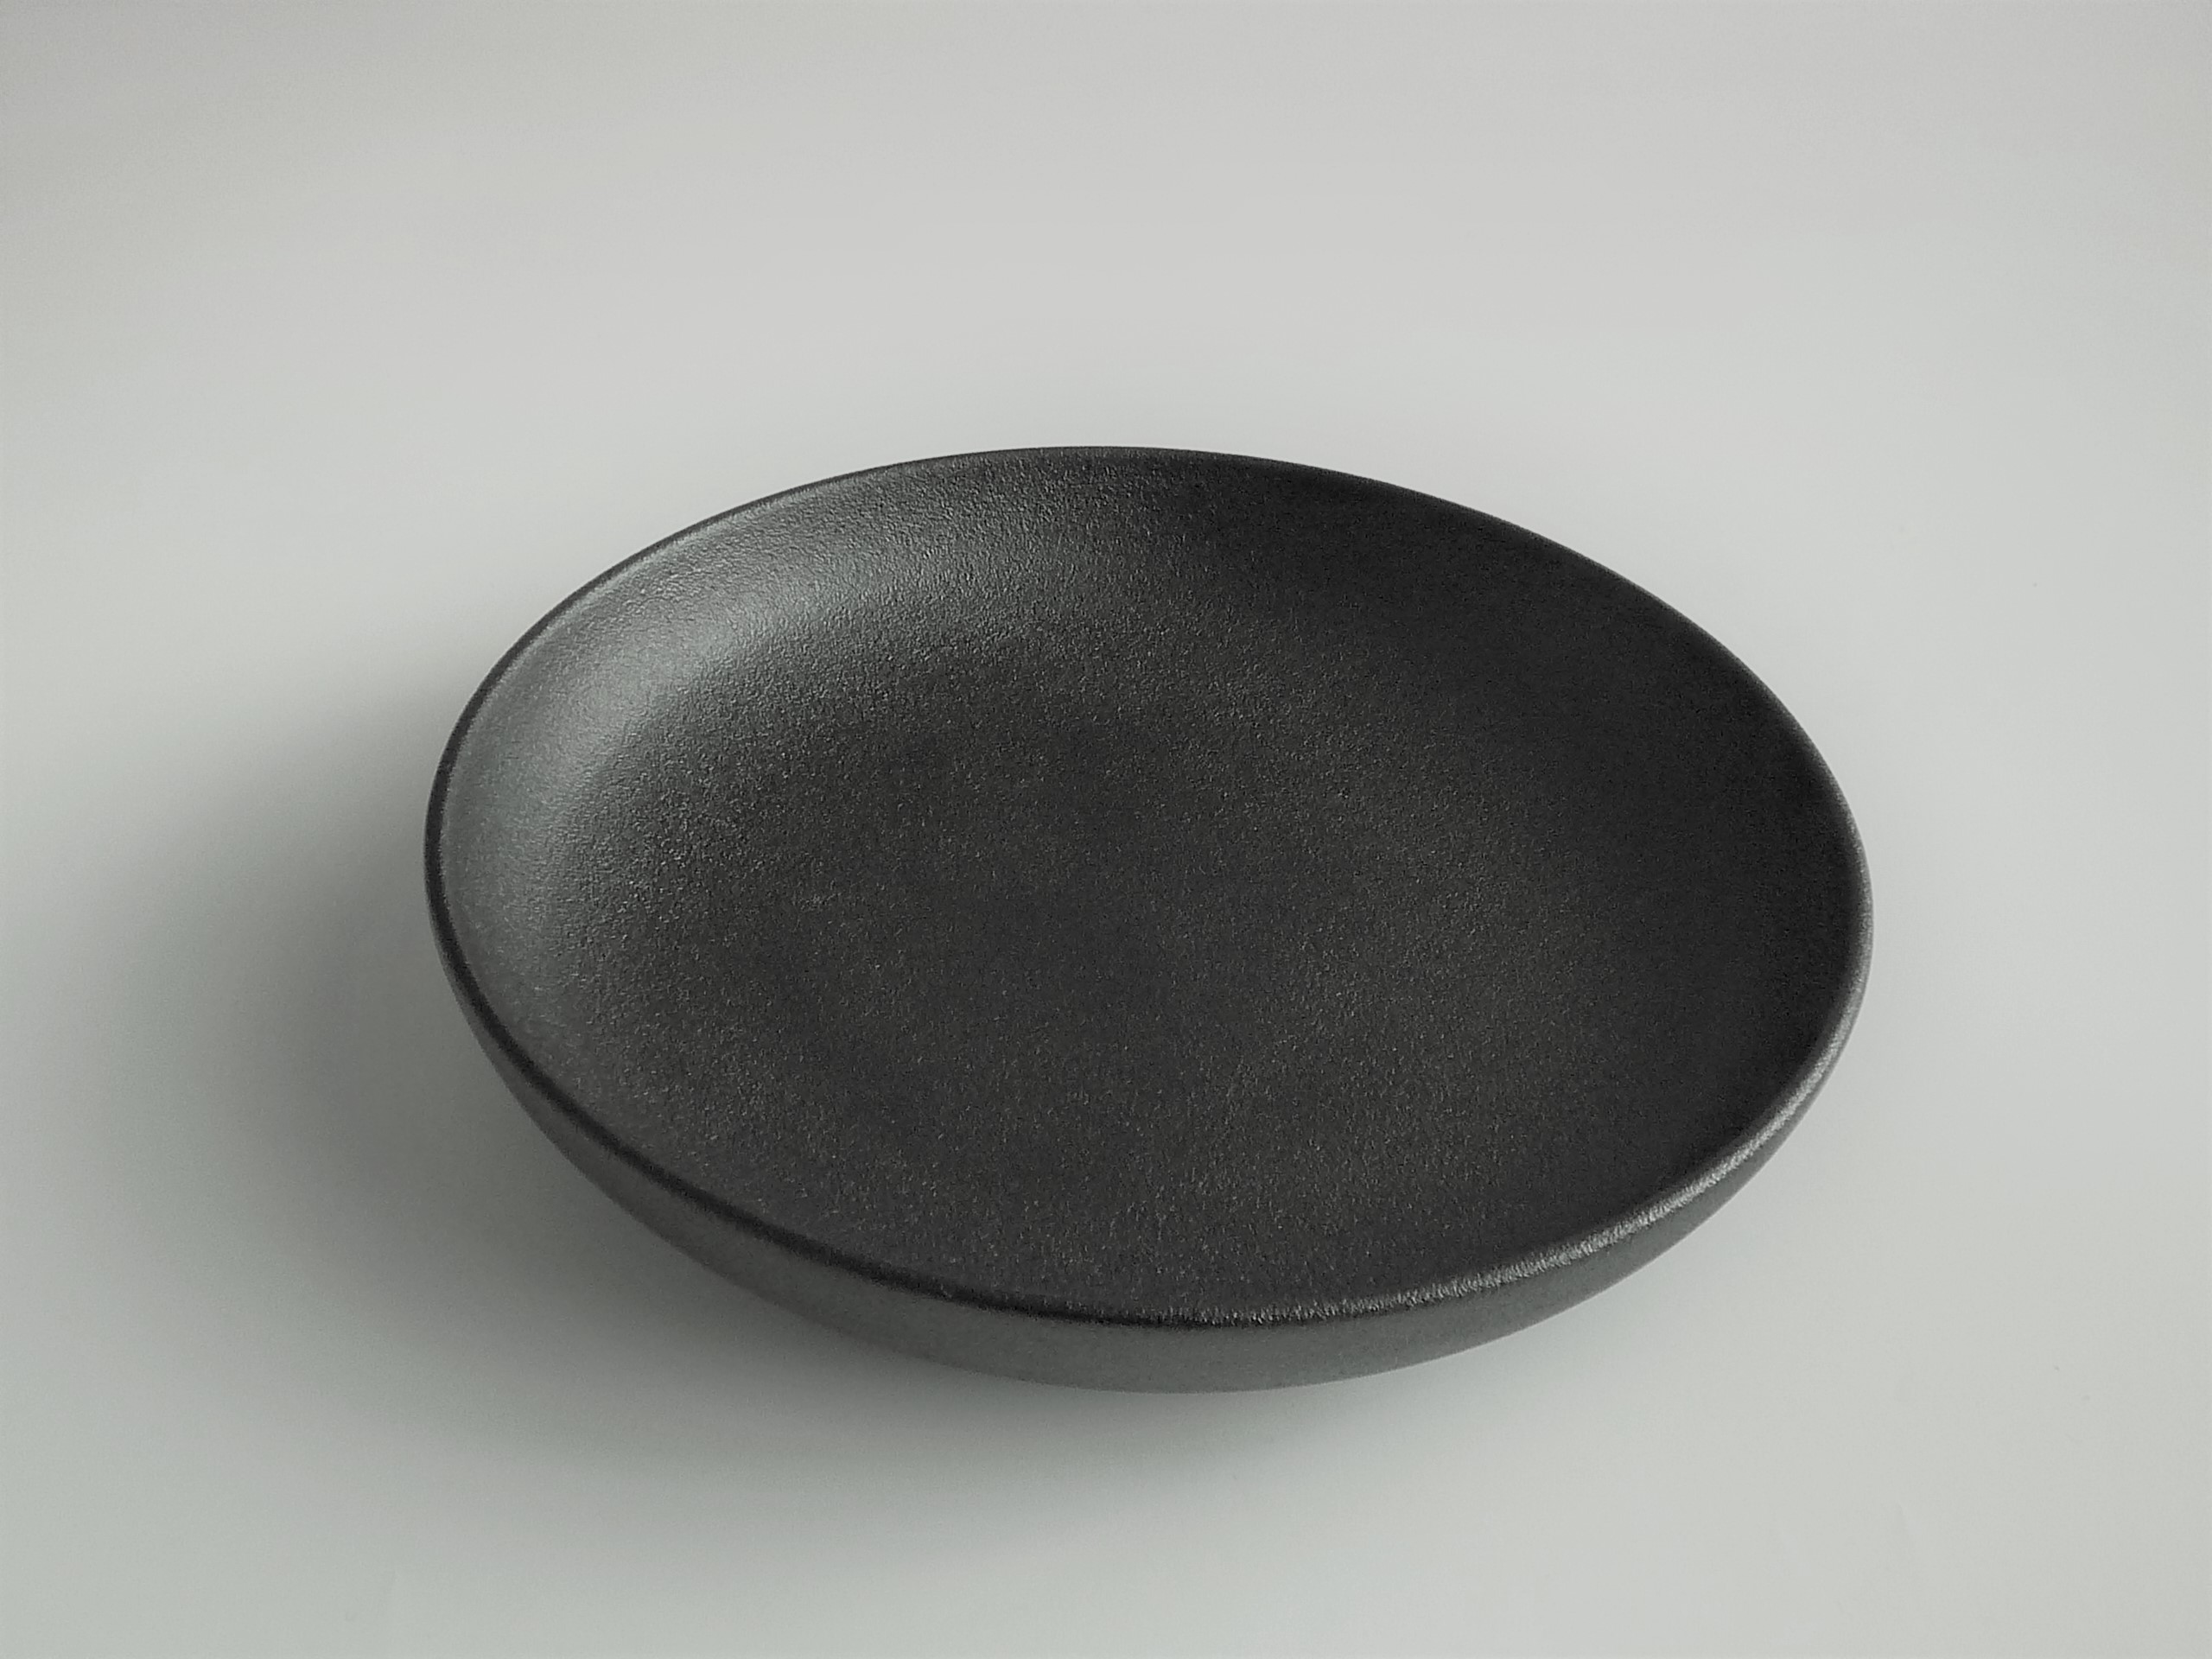 輪島漆塗り 丸皿蒔地(黒)7寸 約21cm